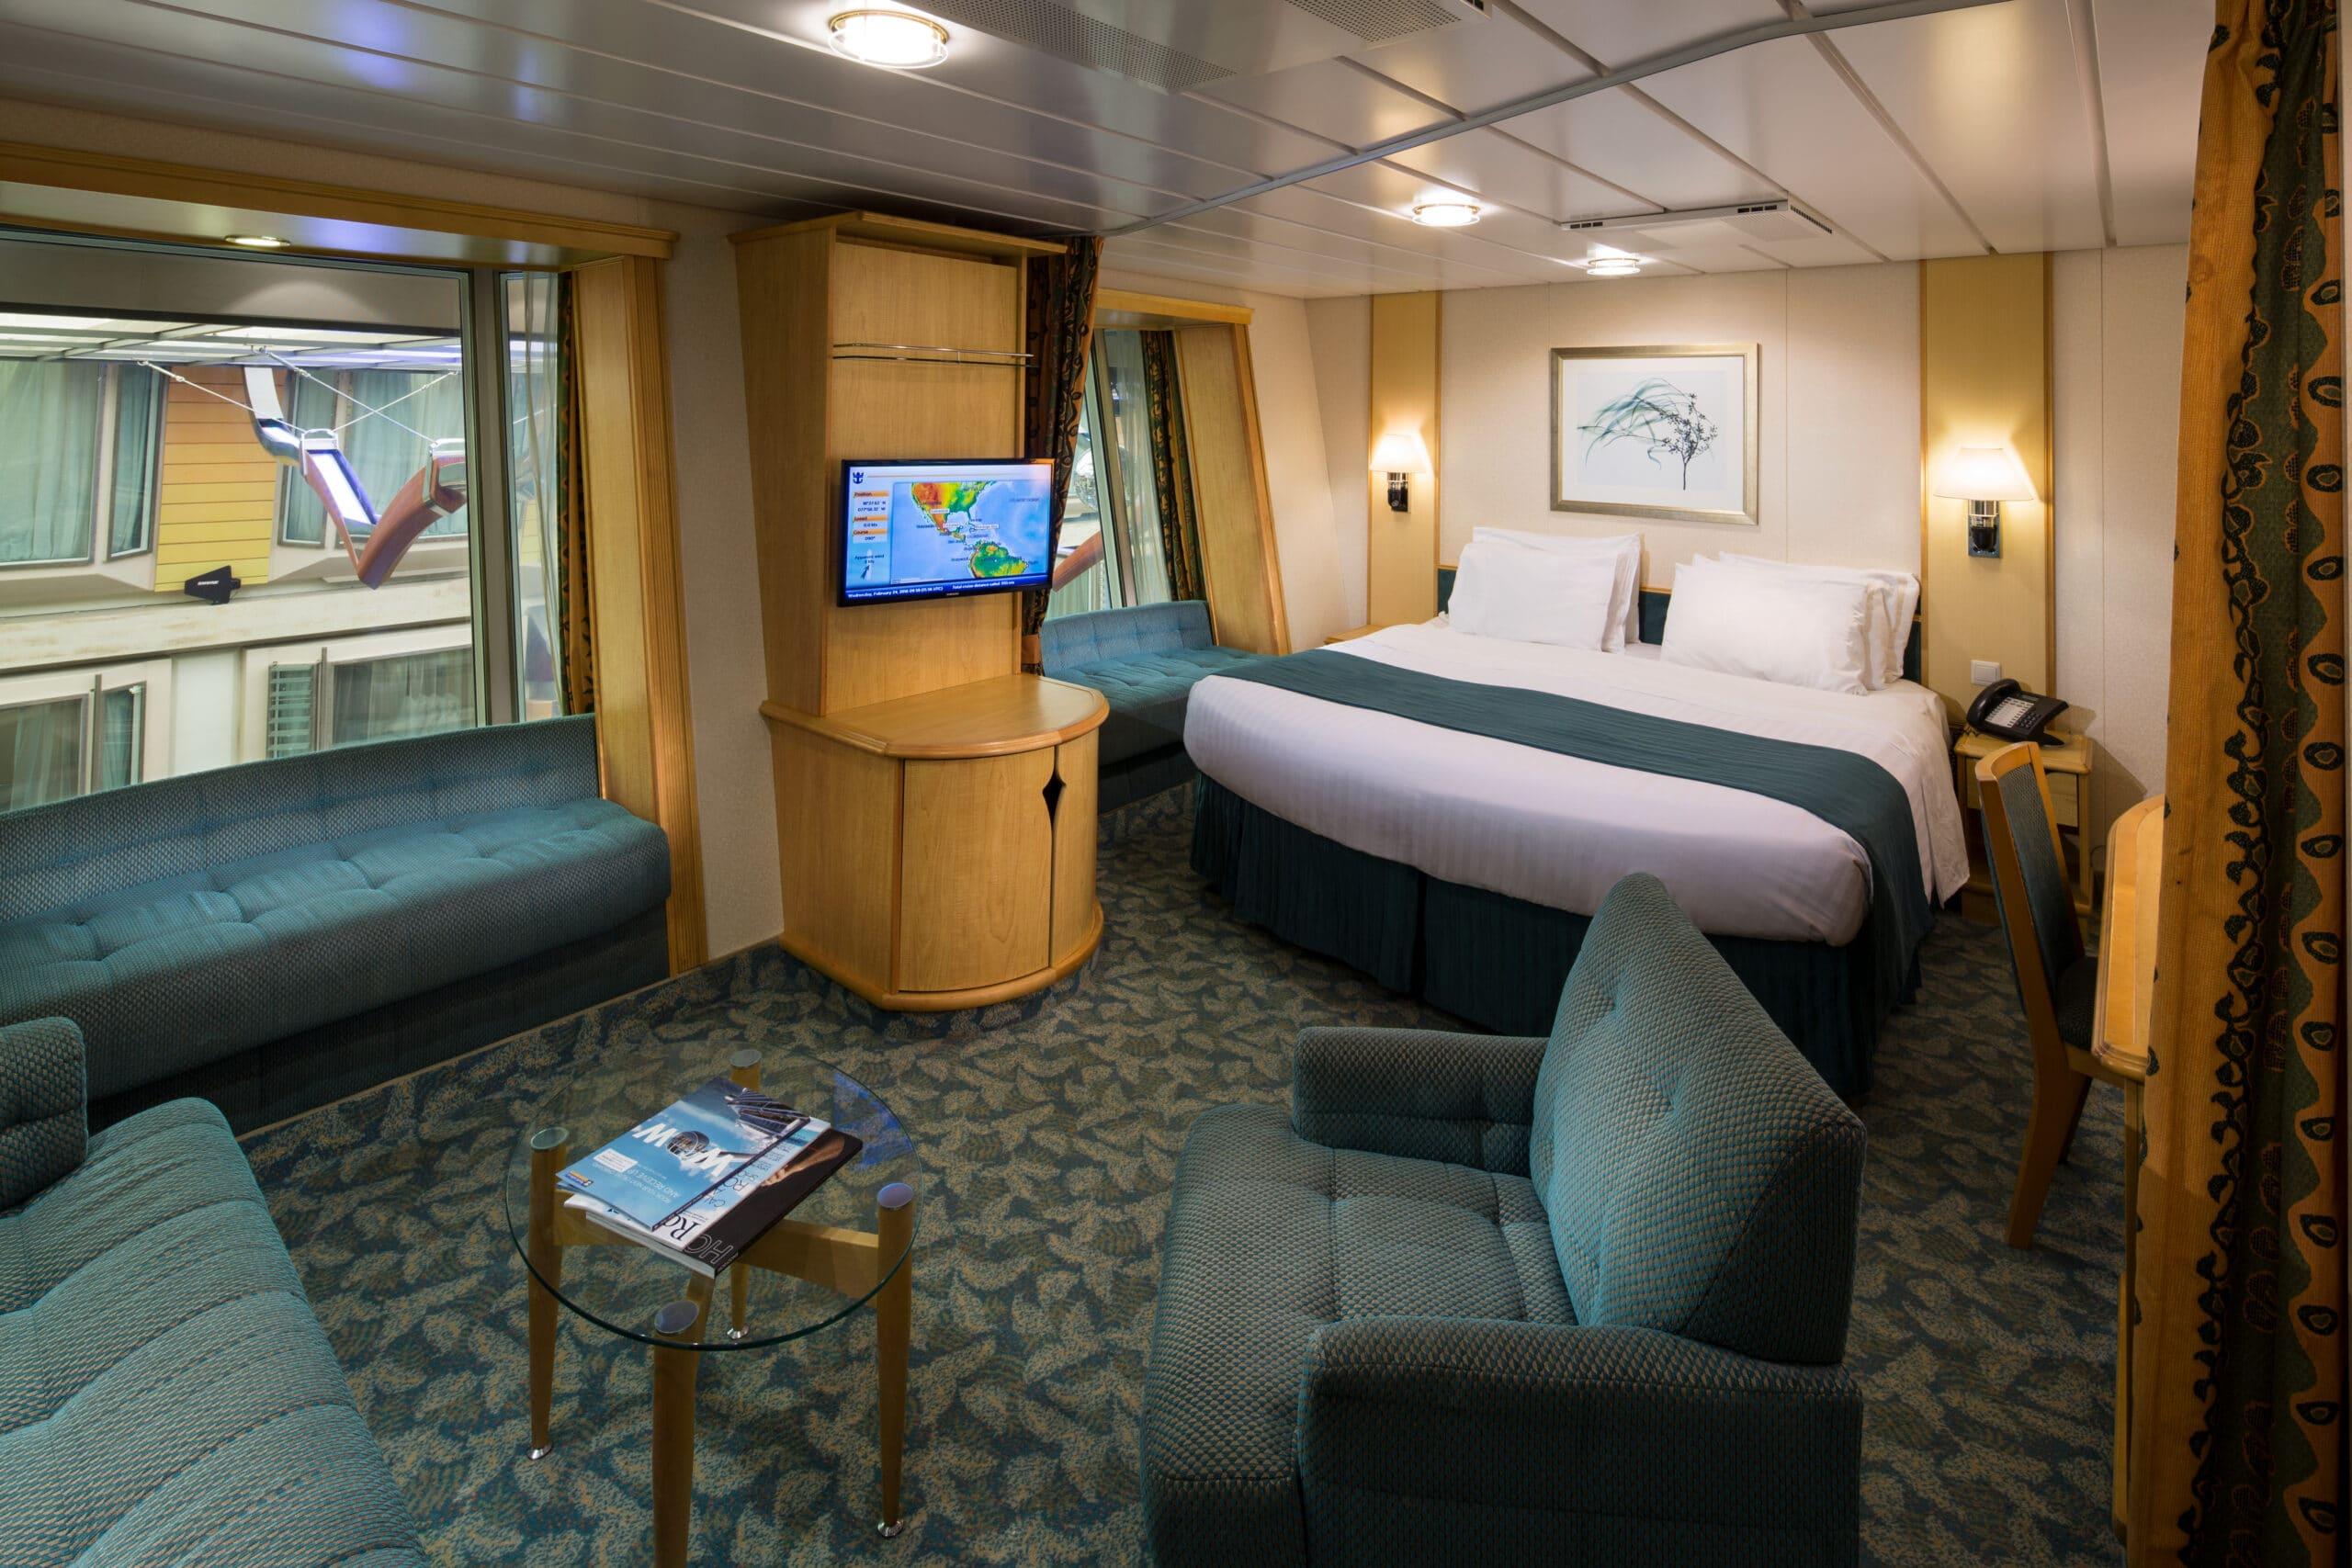 Royal-Caribbean-International-Freedom-of-the-Seas-Liberty-of-the Seas-Independence-of-the-seas-schip-cruiseschip-categorie 1Q-Ruime-promenade-binnenhut